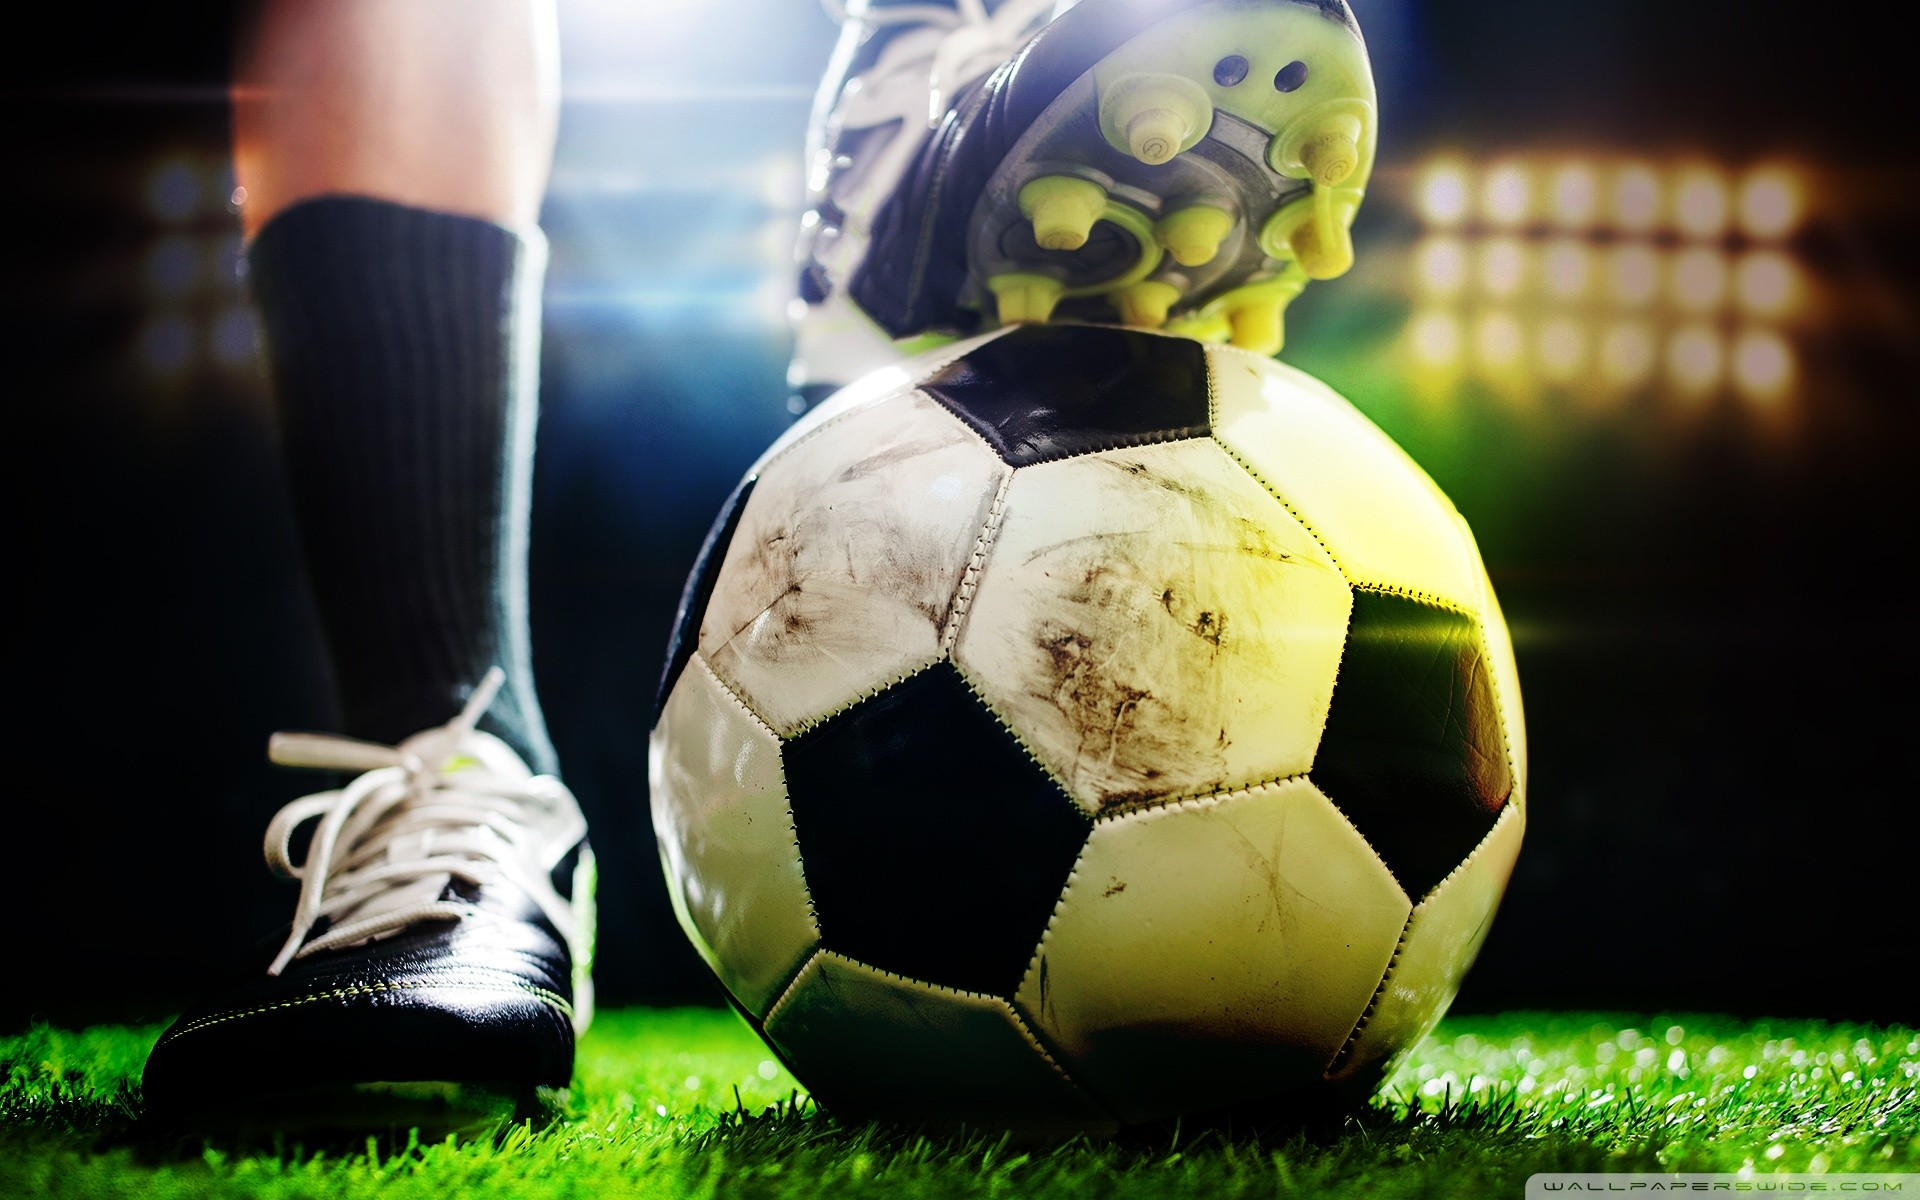 Goal Blue Football Wallpaper: Soccer Desktop Backgrounds (62+ Images